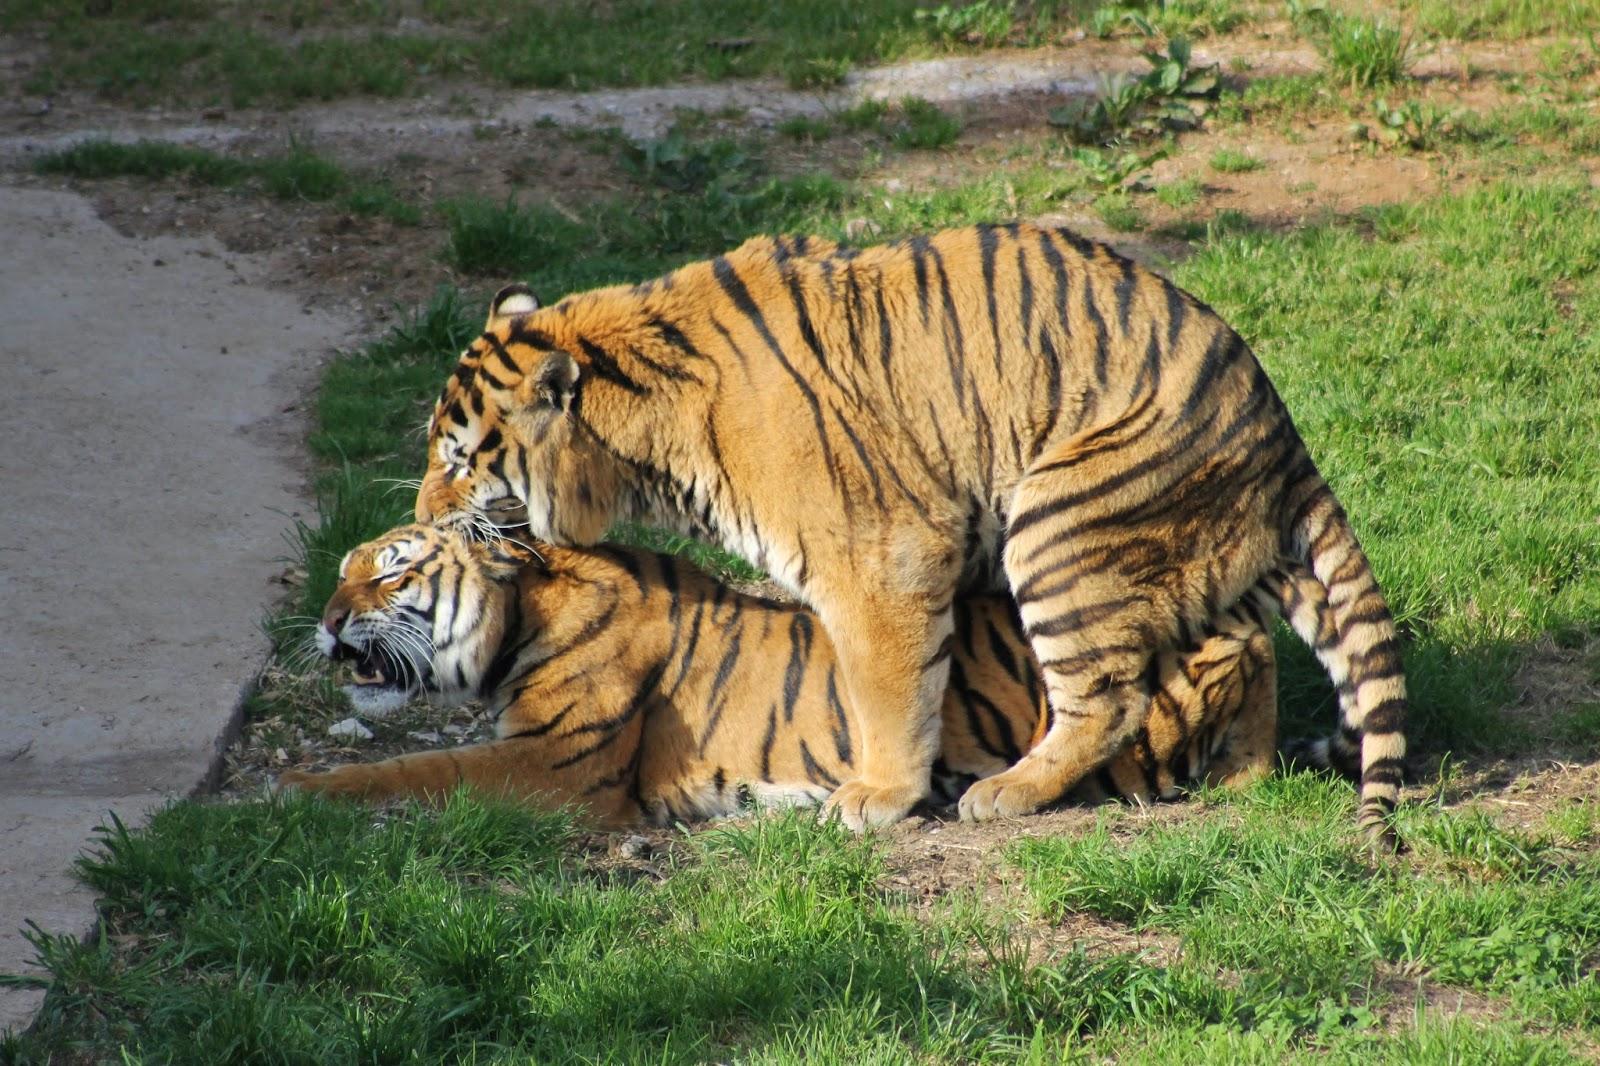 Graceland abril 2014 - Imagenes de animales apareandose ...